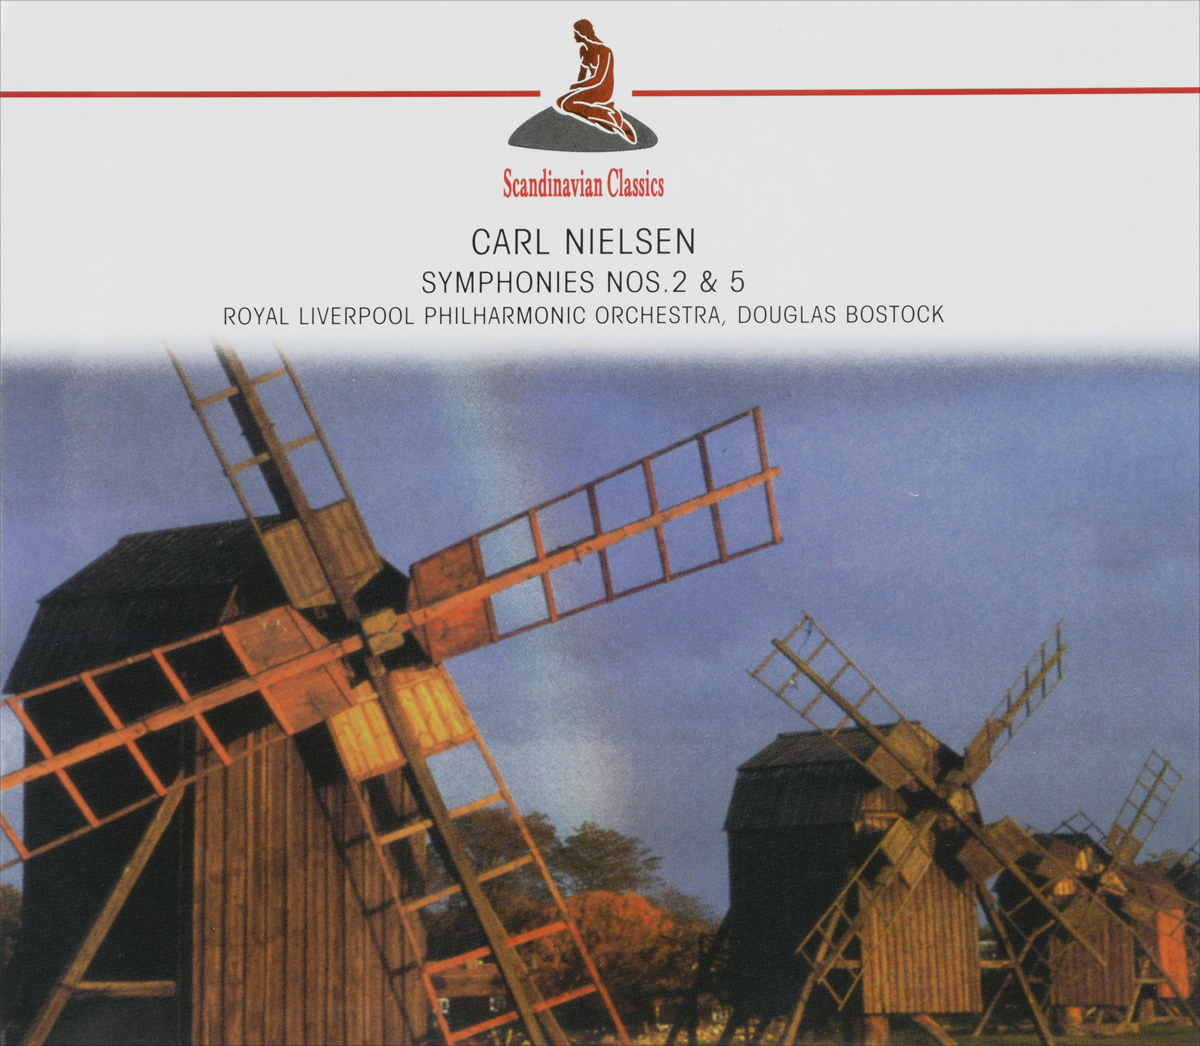 Royal Liverpool Philharmonic Orchestra,Дуглас Босток Scandinavian Classics. Royal Liverpool Philharmonic Orchestra, Douglas Bostock. Nielsen. Sinfonien Nos.2 & 5